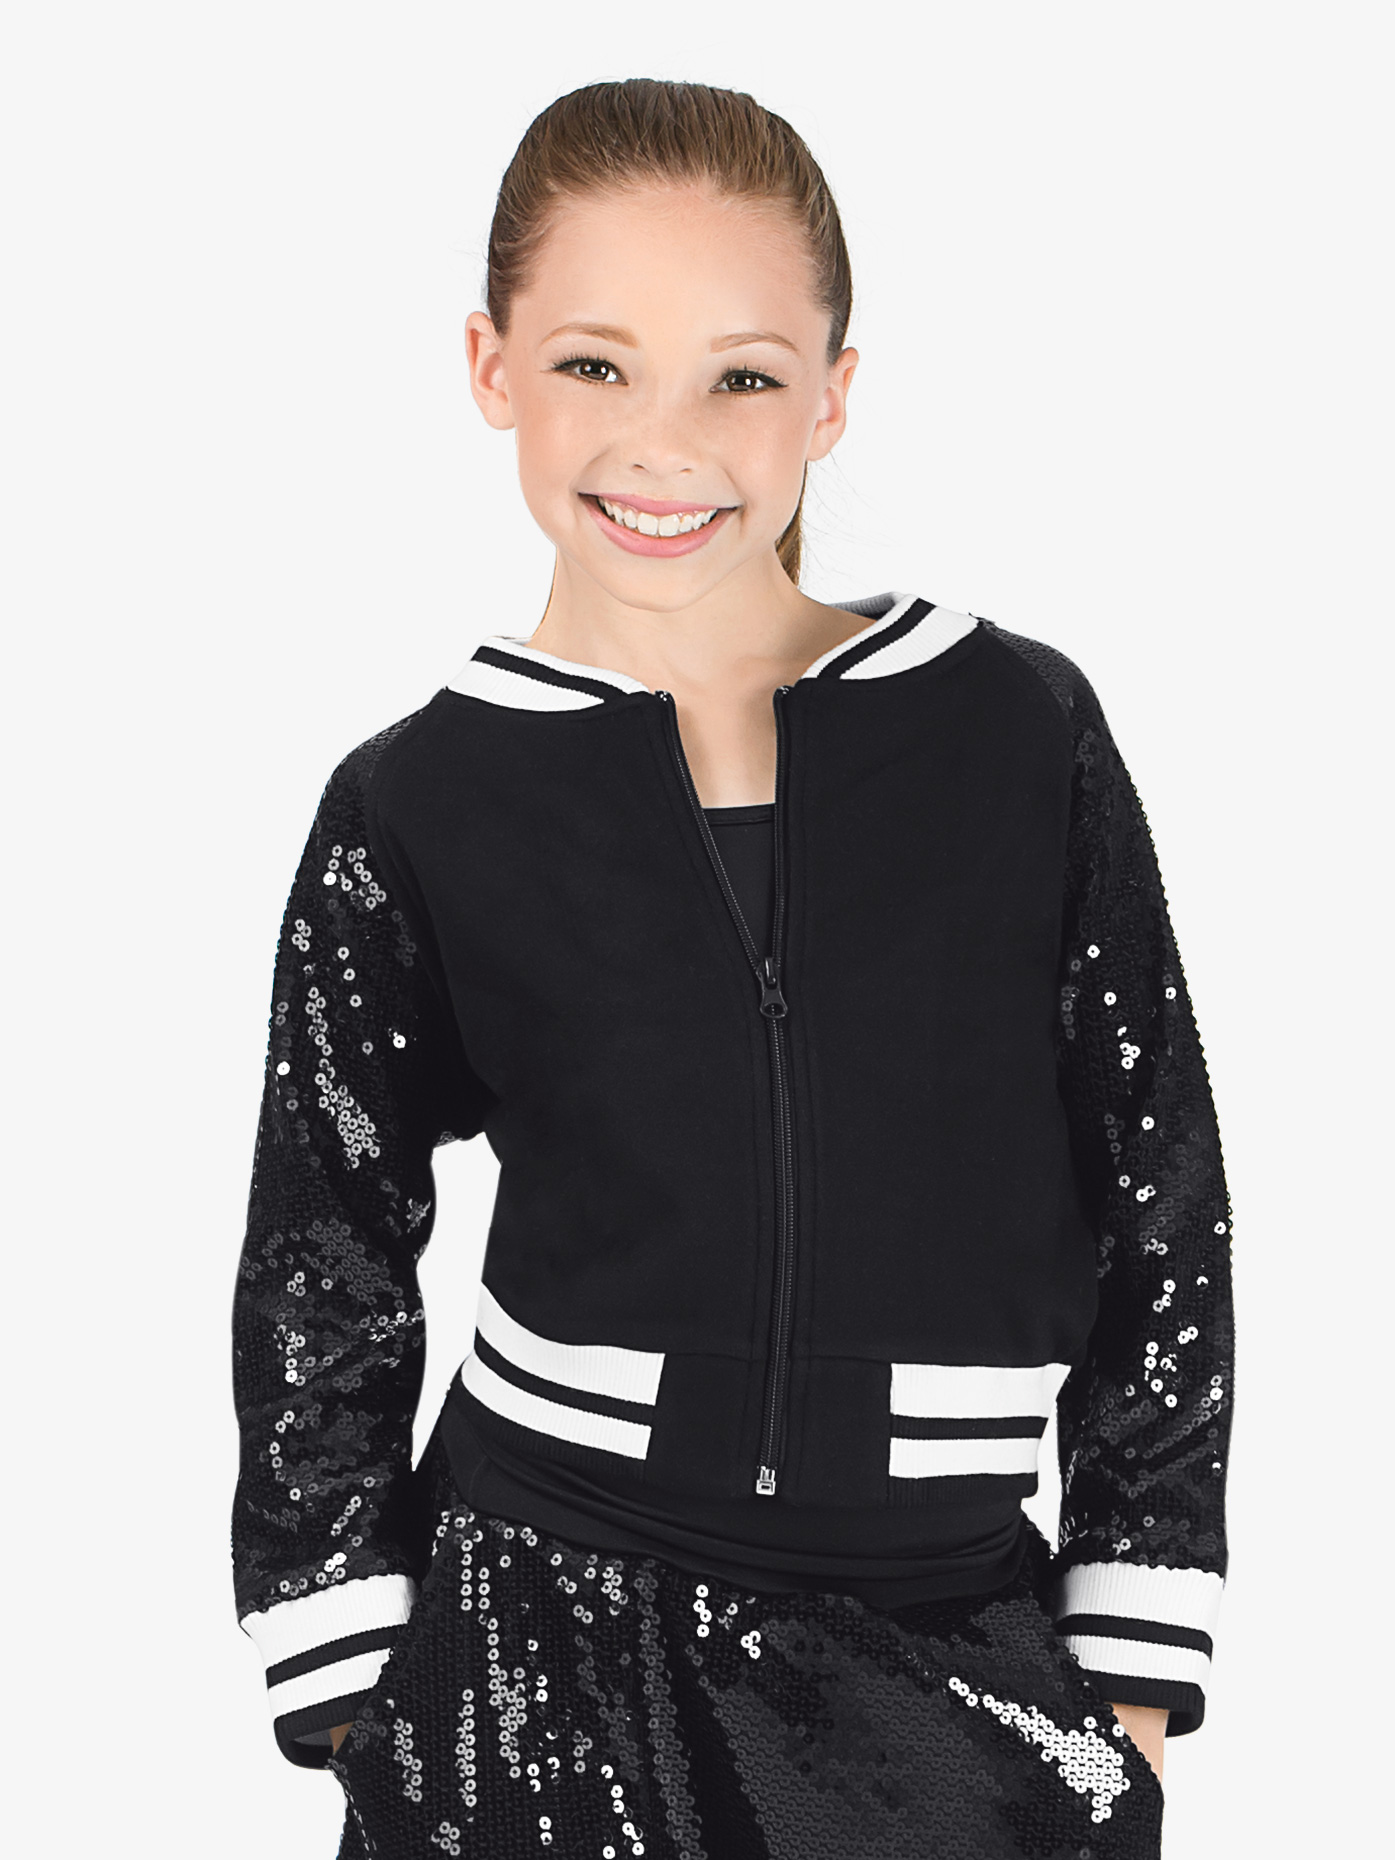 Double Platinum Girls Sequin Varsity Jacket N7218C